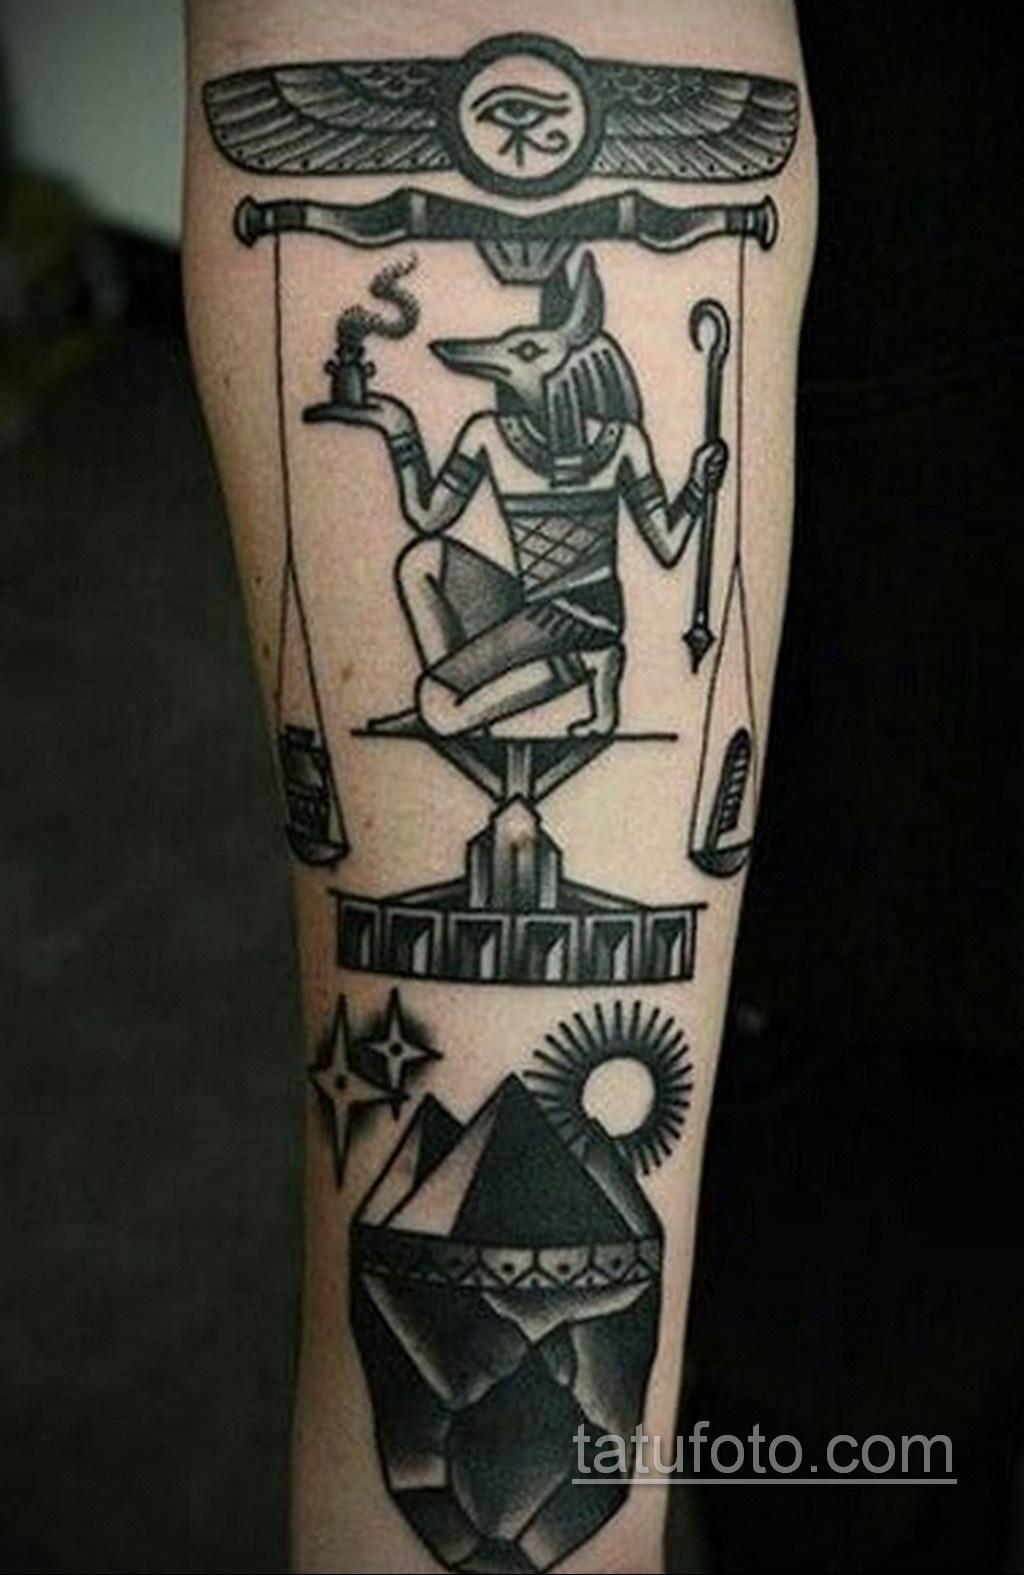 Фото анубис тату на предплечье 25.10.2020 №001 -forearm tattoo- tatufoto.com